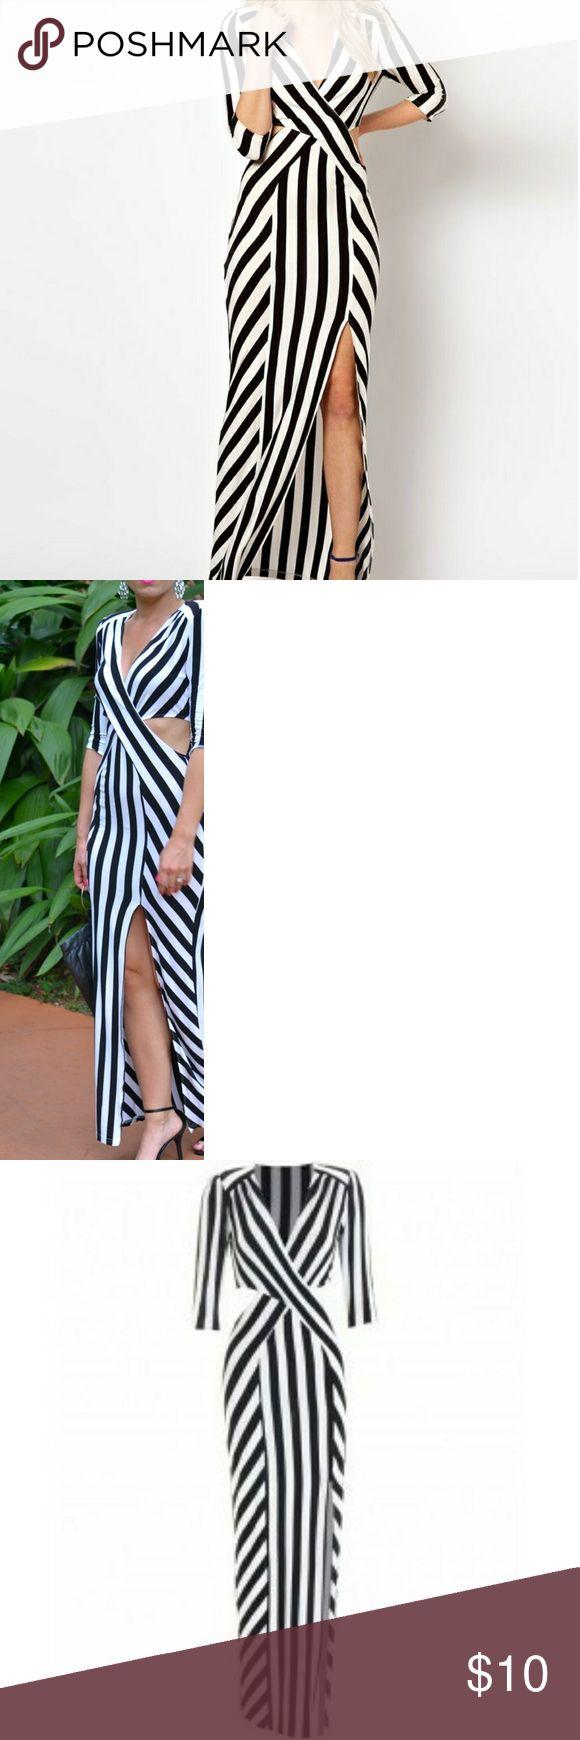 ASOS  black and white striped maxi dress Black and white striped maxi dress with side cut outs and thigh slit ASOS Dresses Maxi